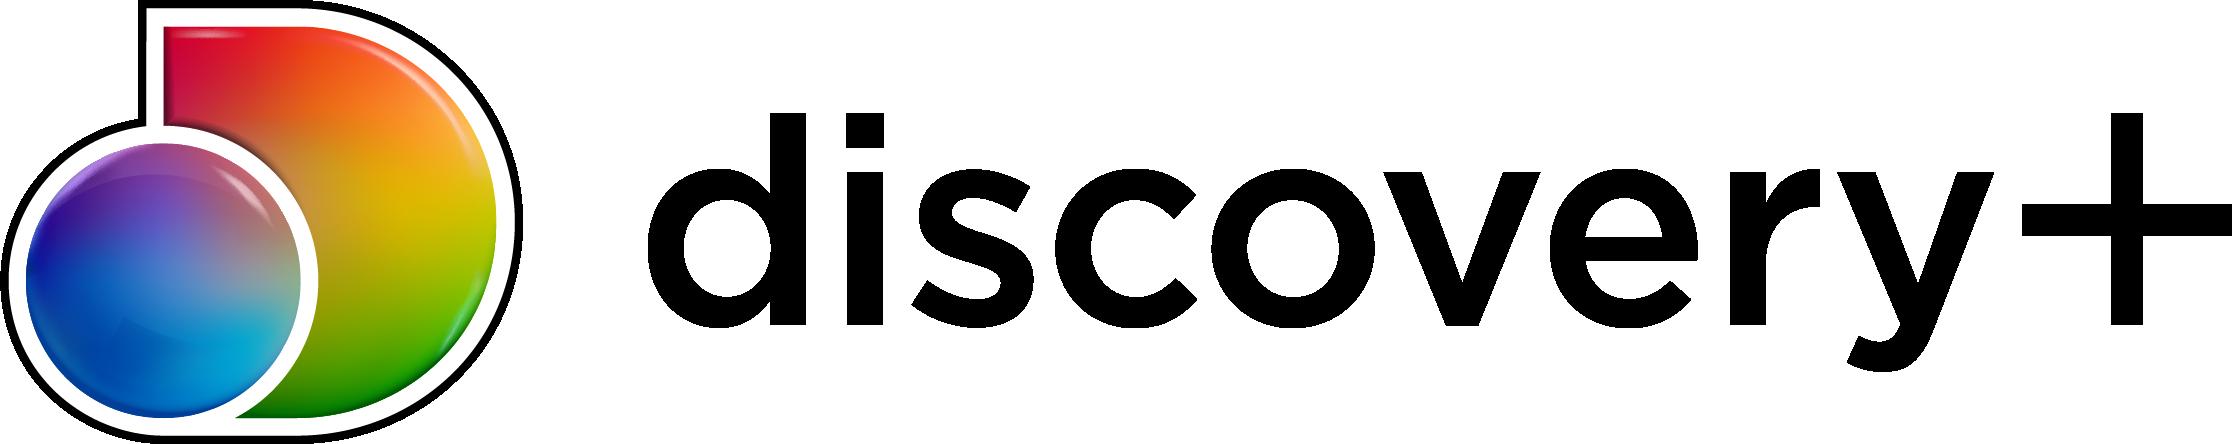 discovery+ logo